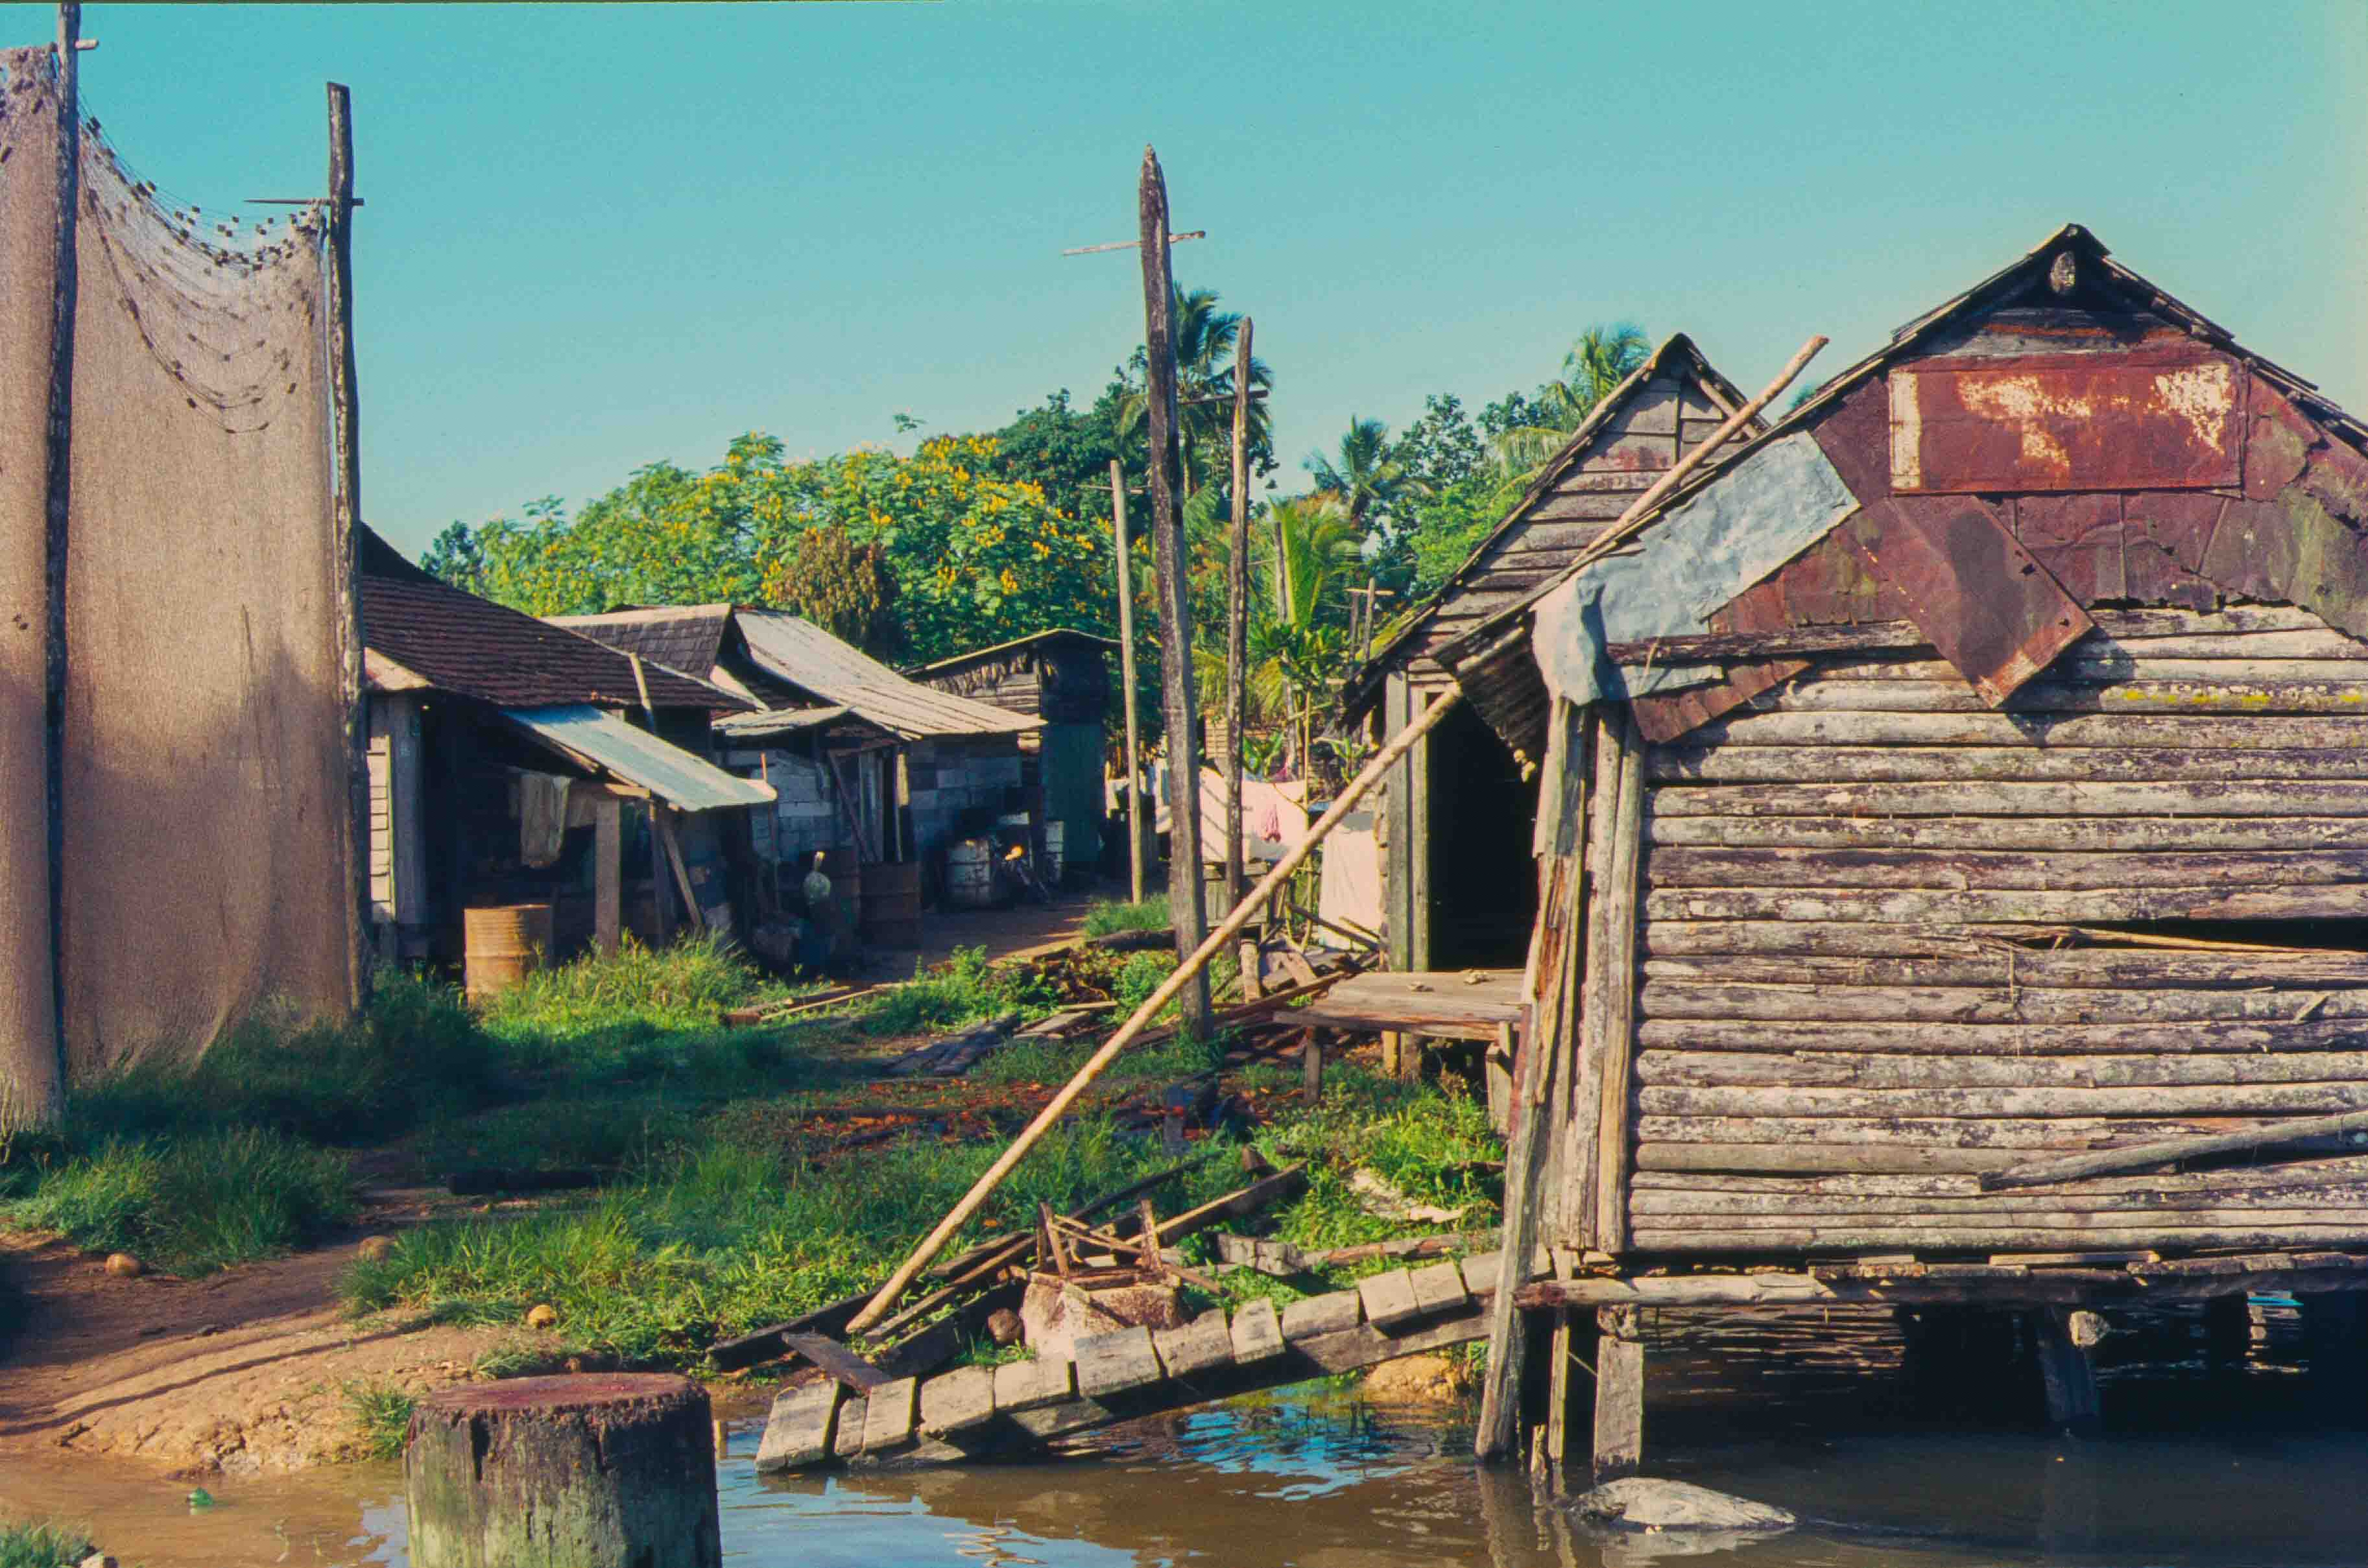 452. Suriname